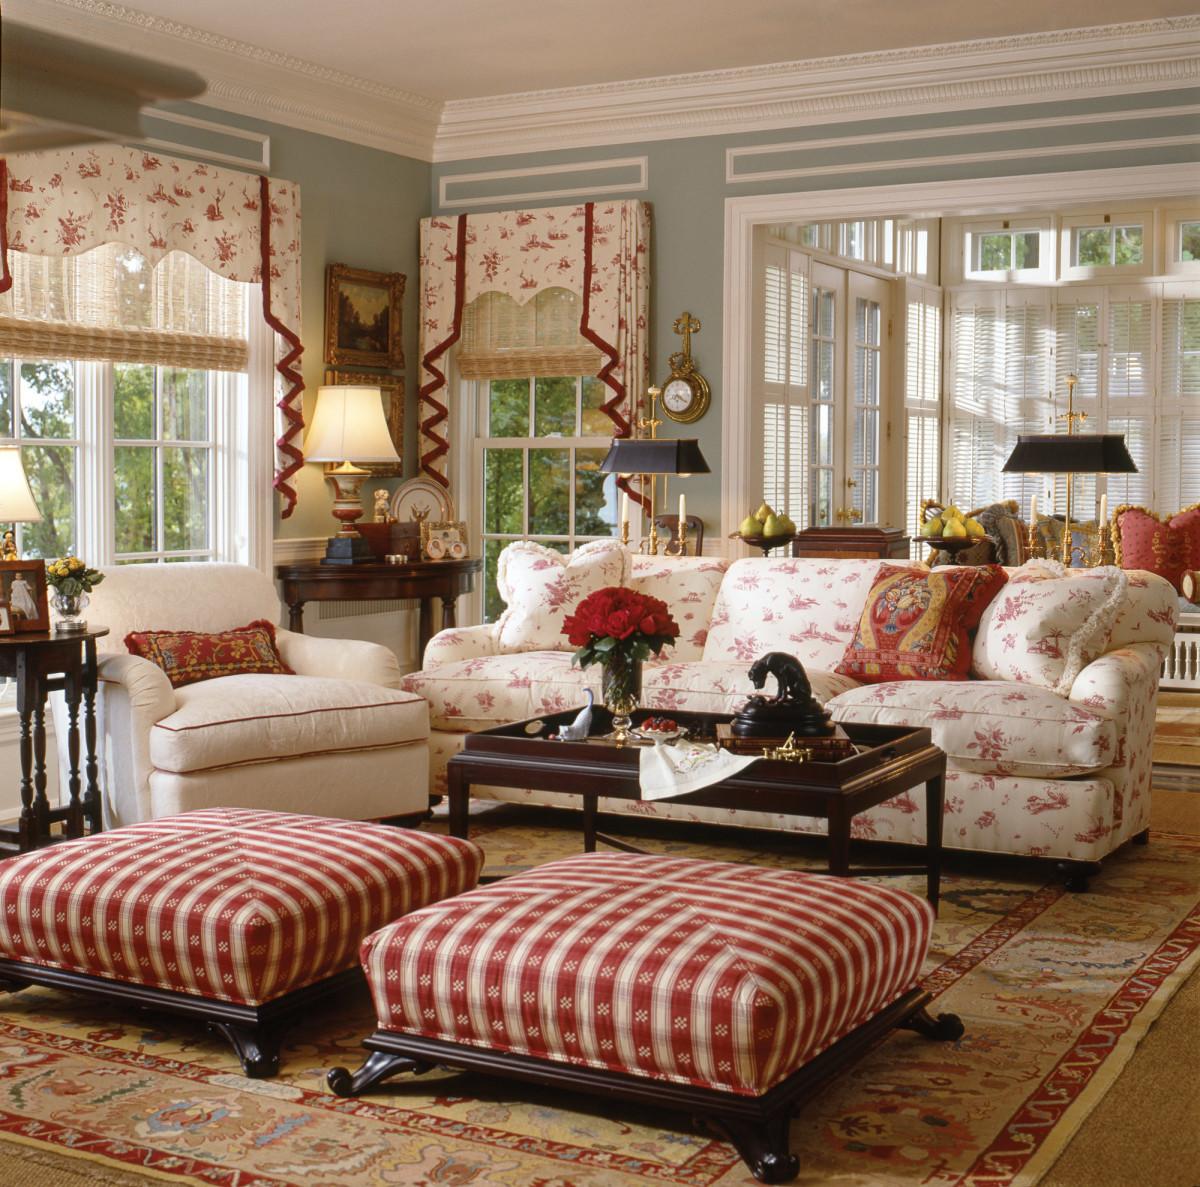 10-regole-per-arredare-casa-in-stile-inglese-29